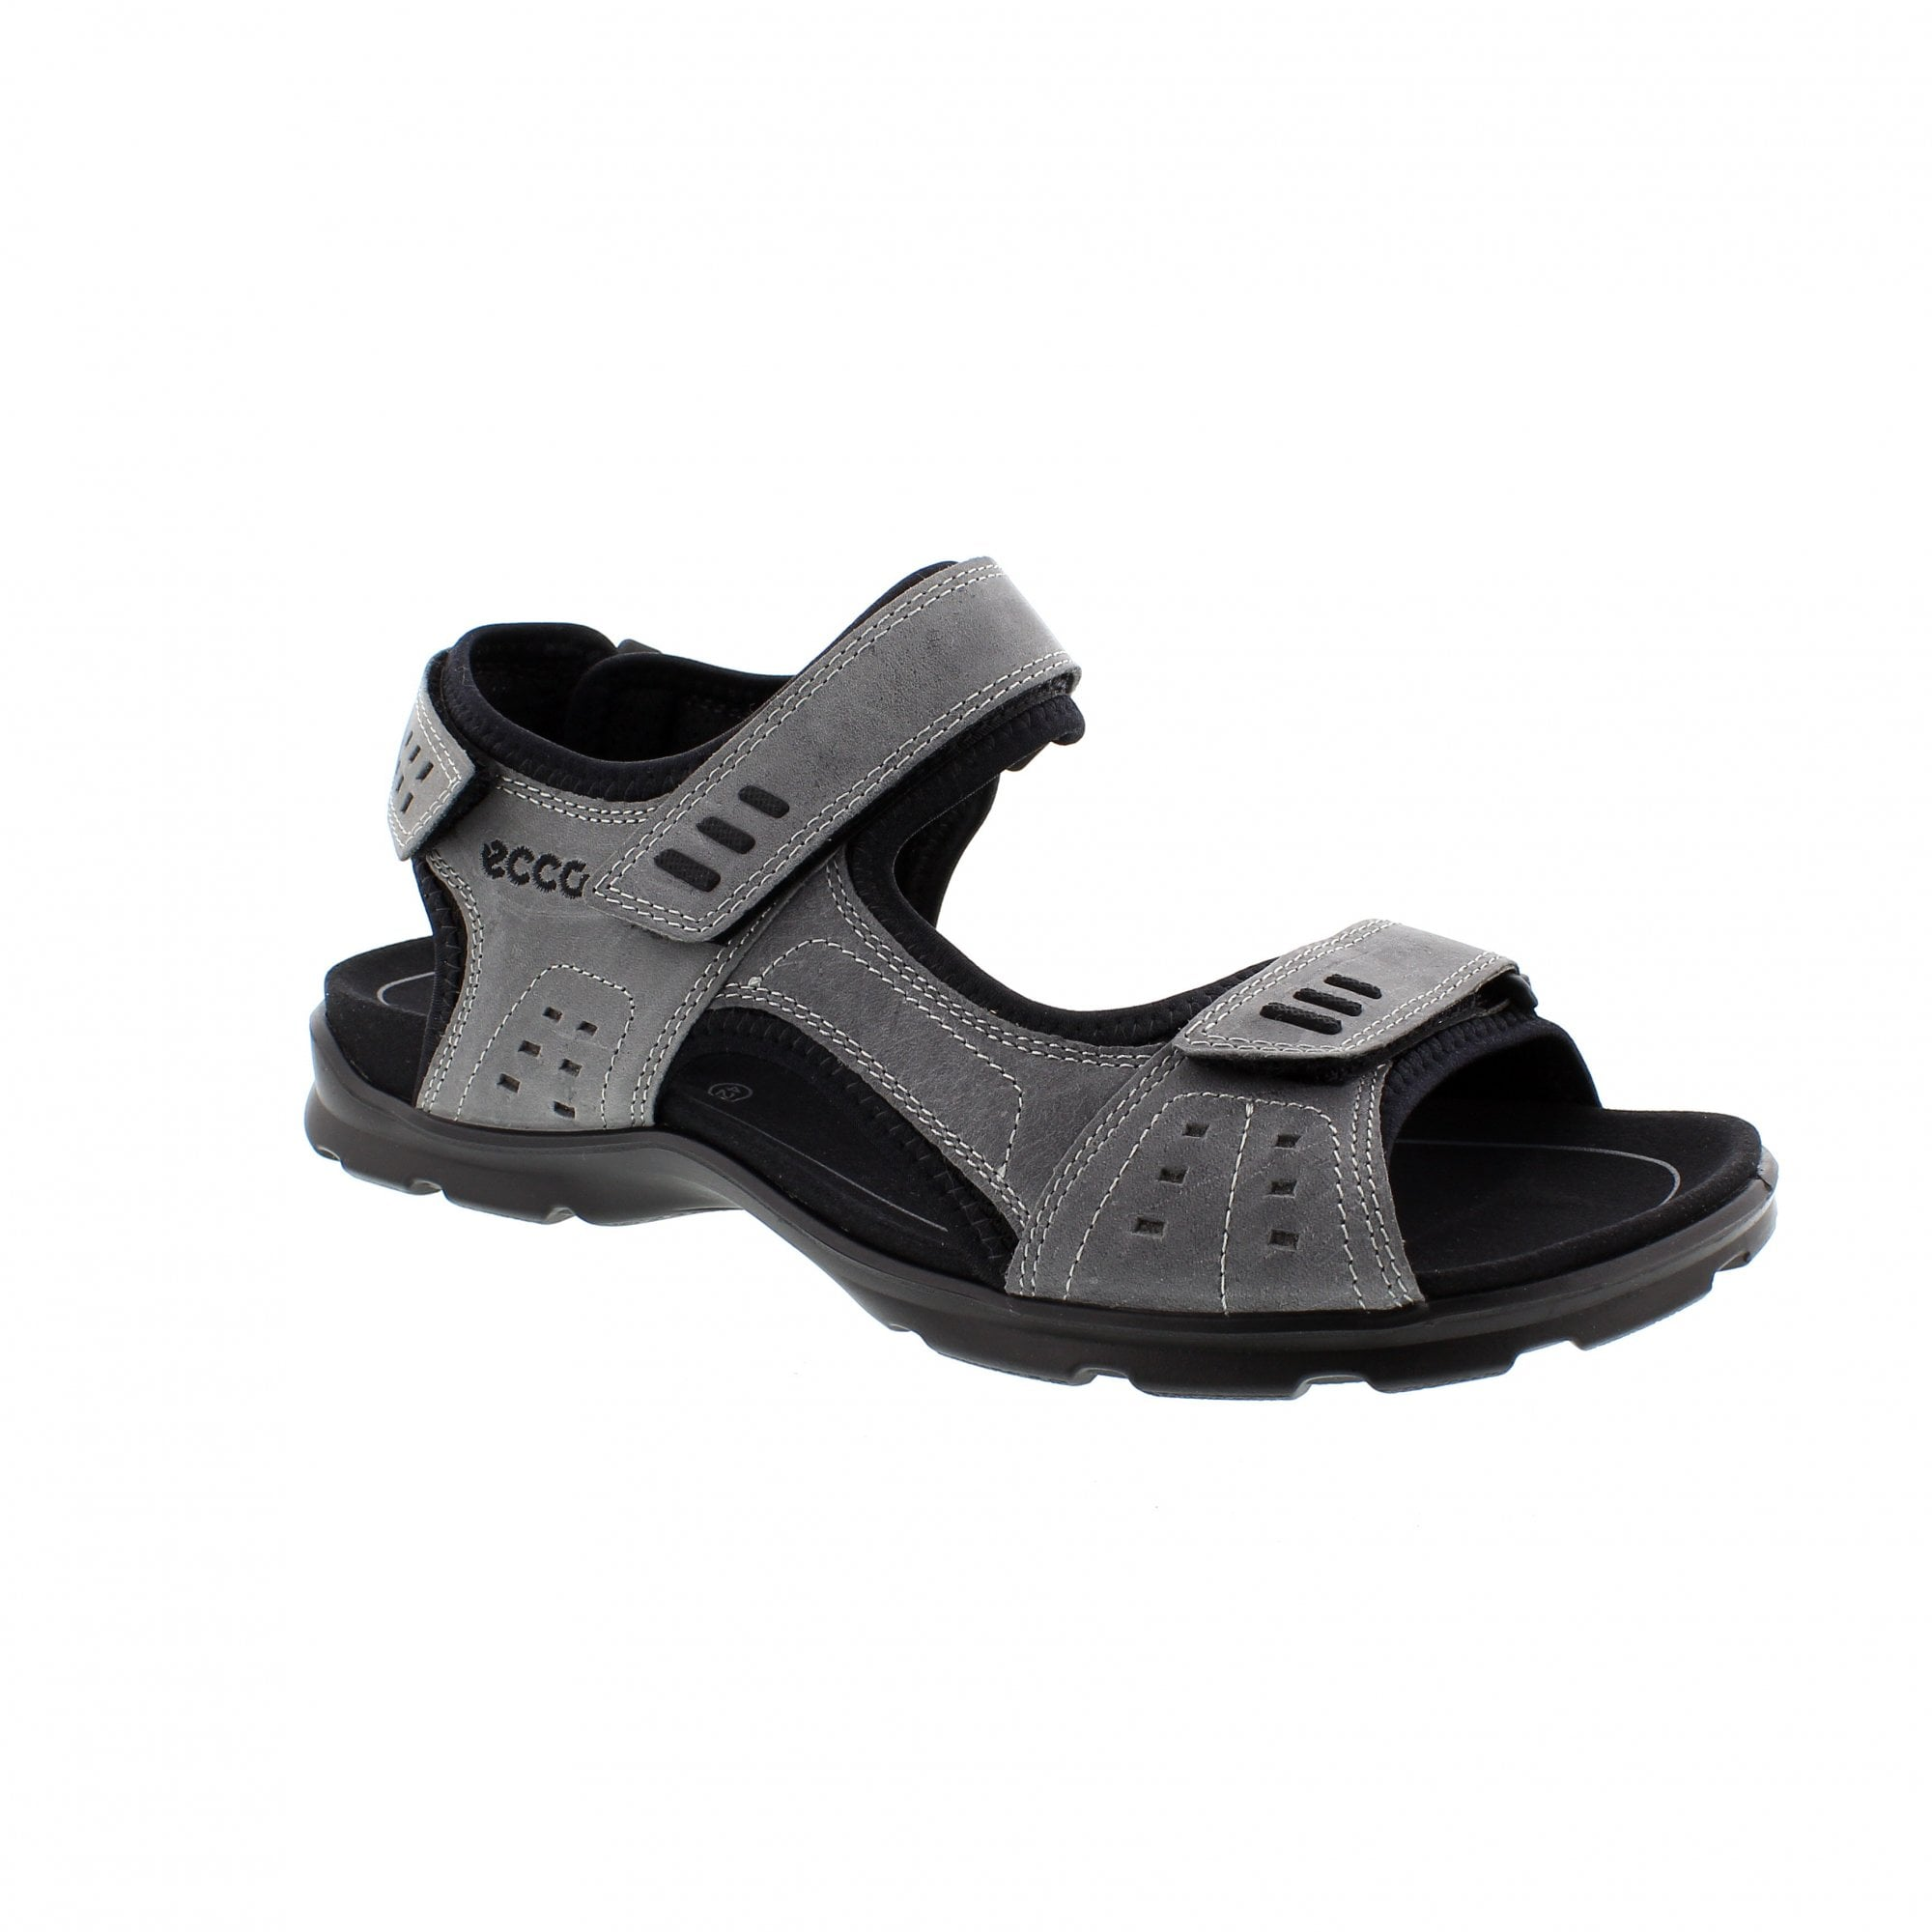 907e13dc5209 Ecco Utah 834114-02244 Mens Walking Sandals